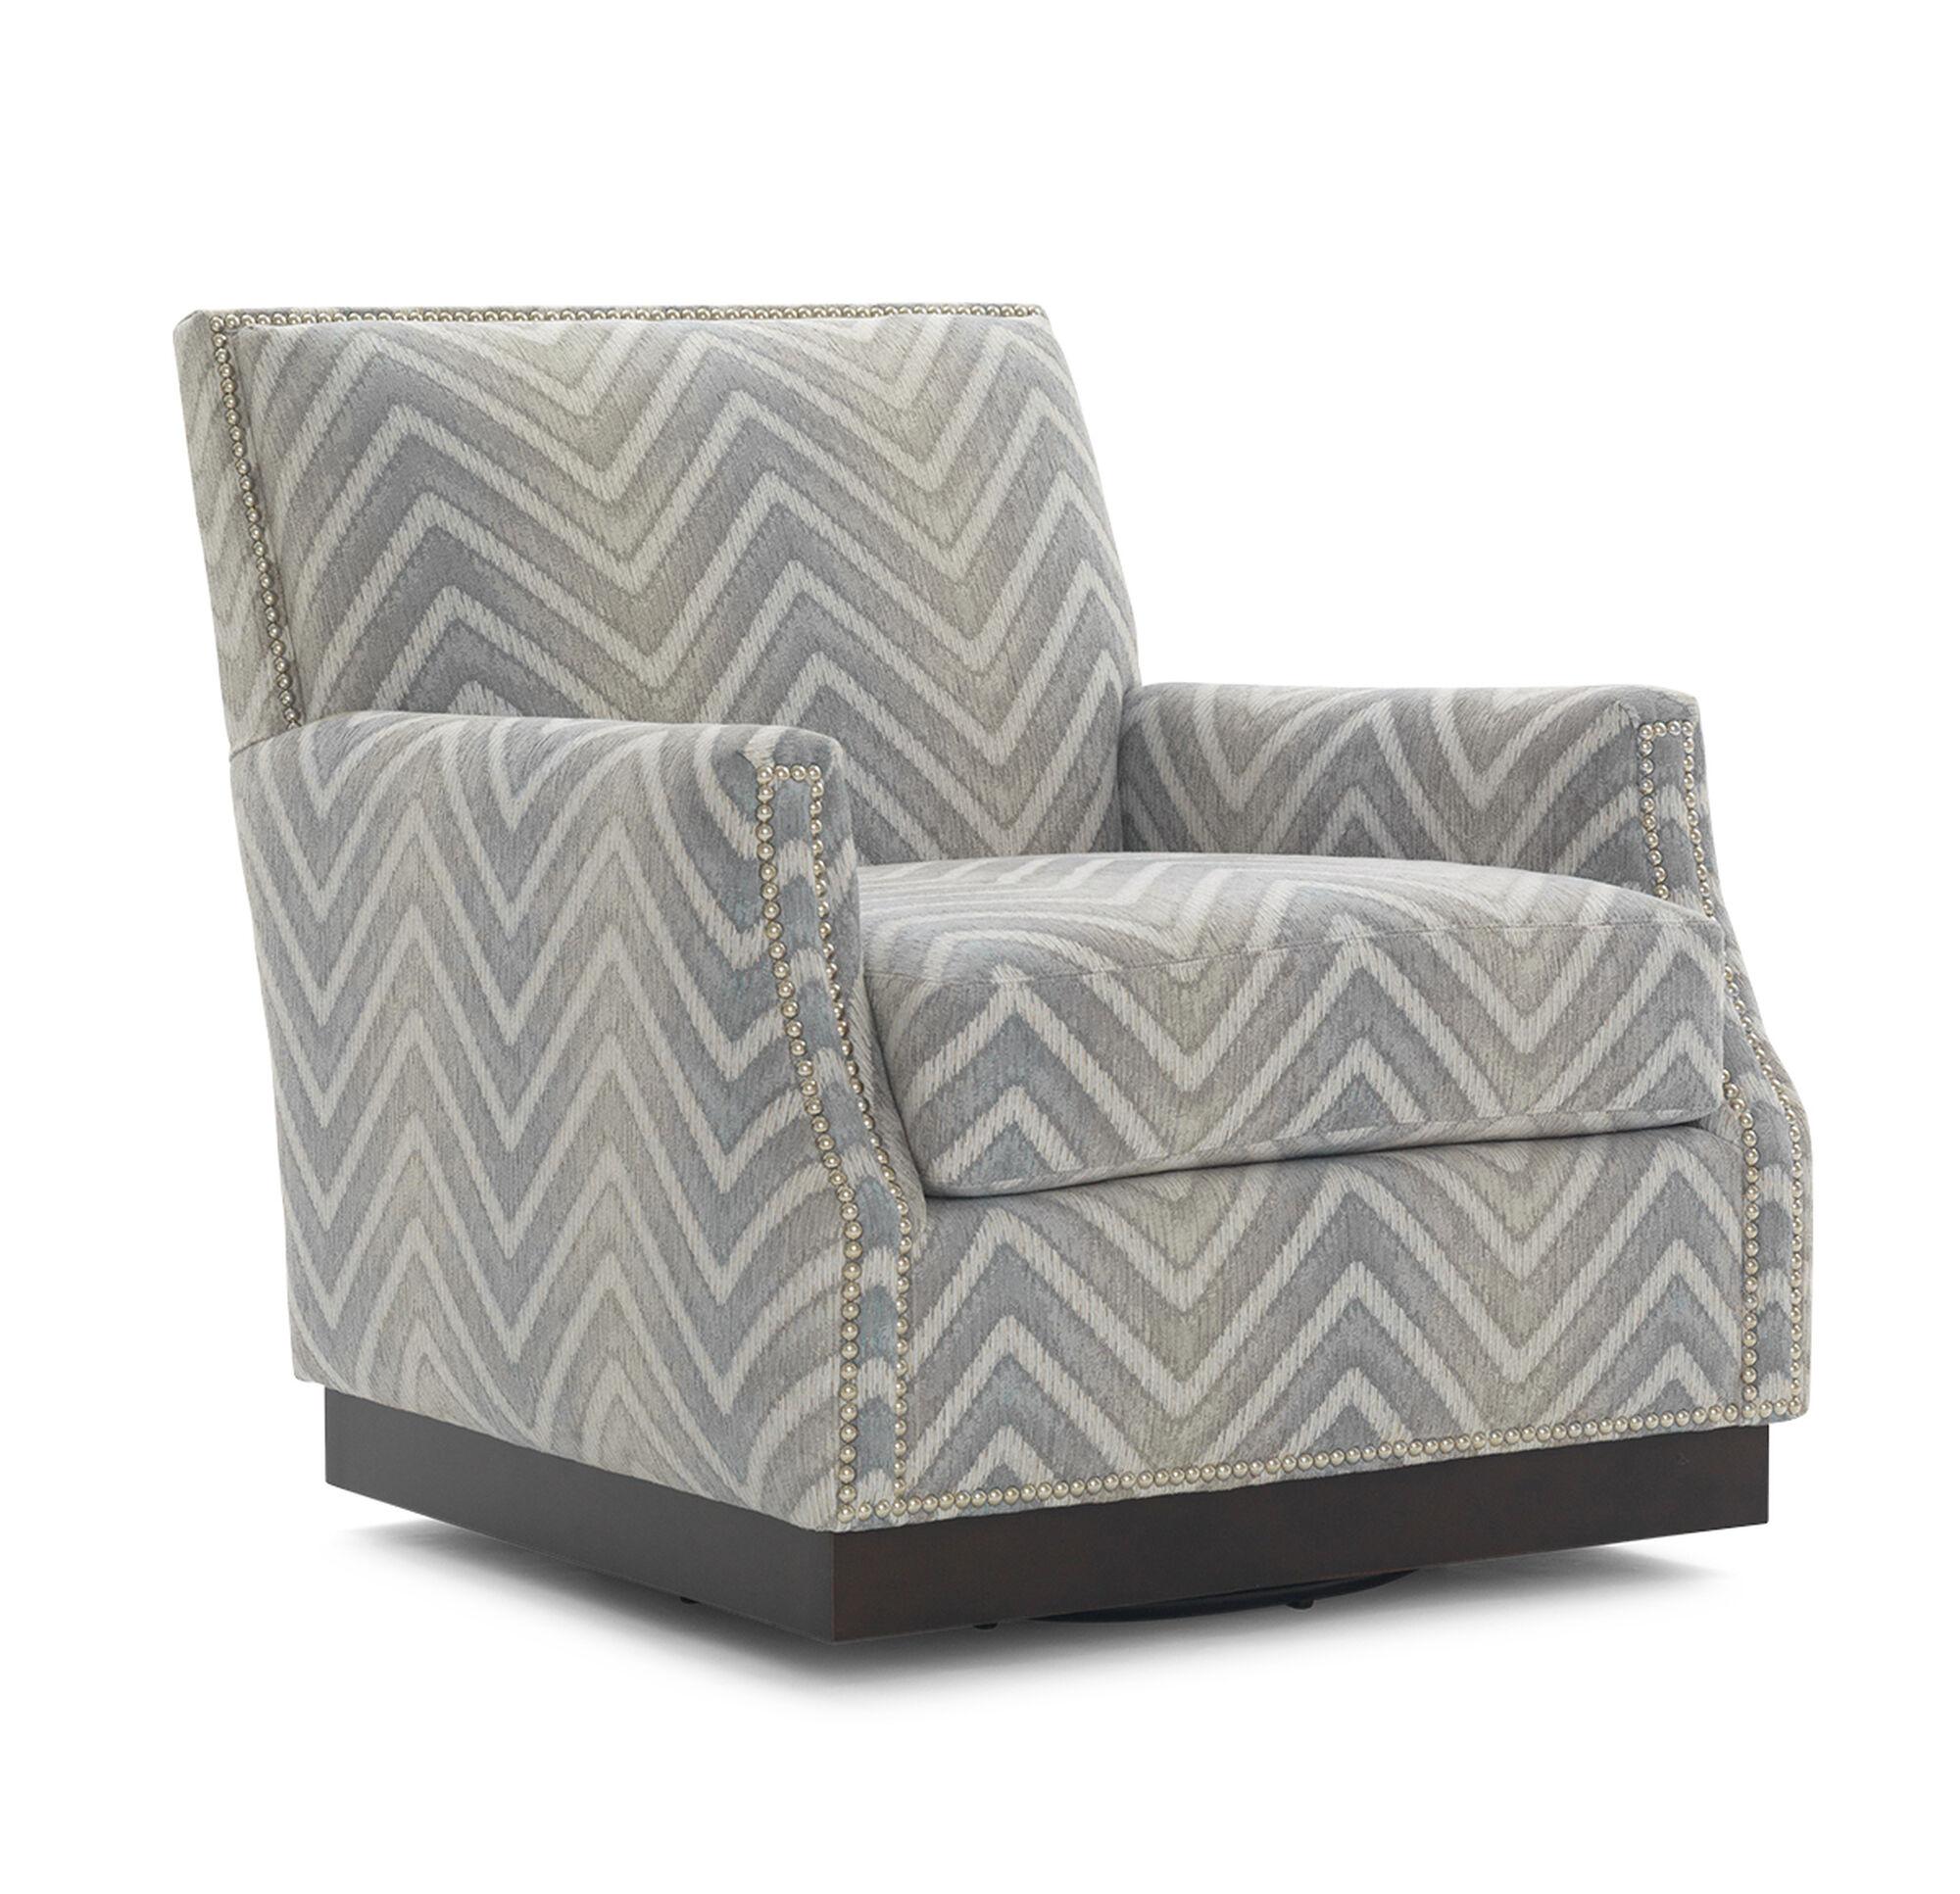 black degree dp faux com studio baxton chair leather with amazon chairs club julian swivel